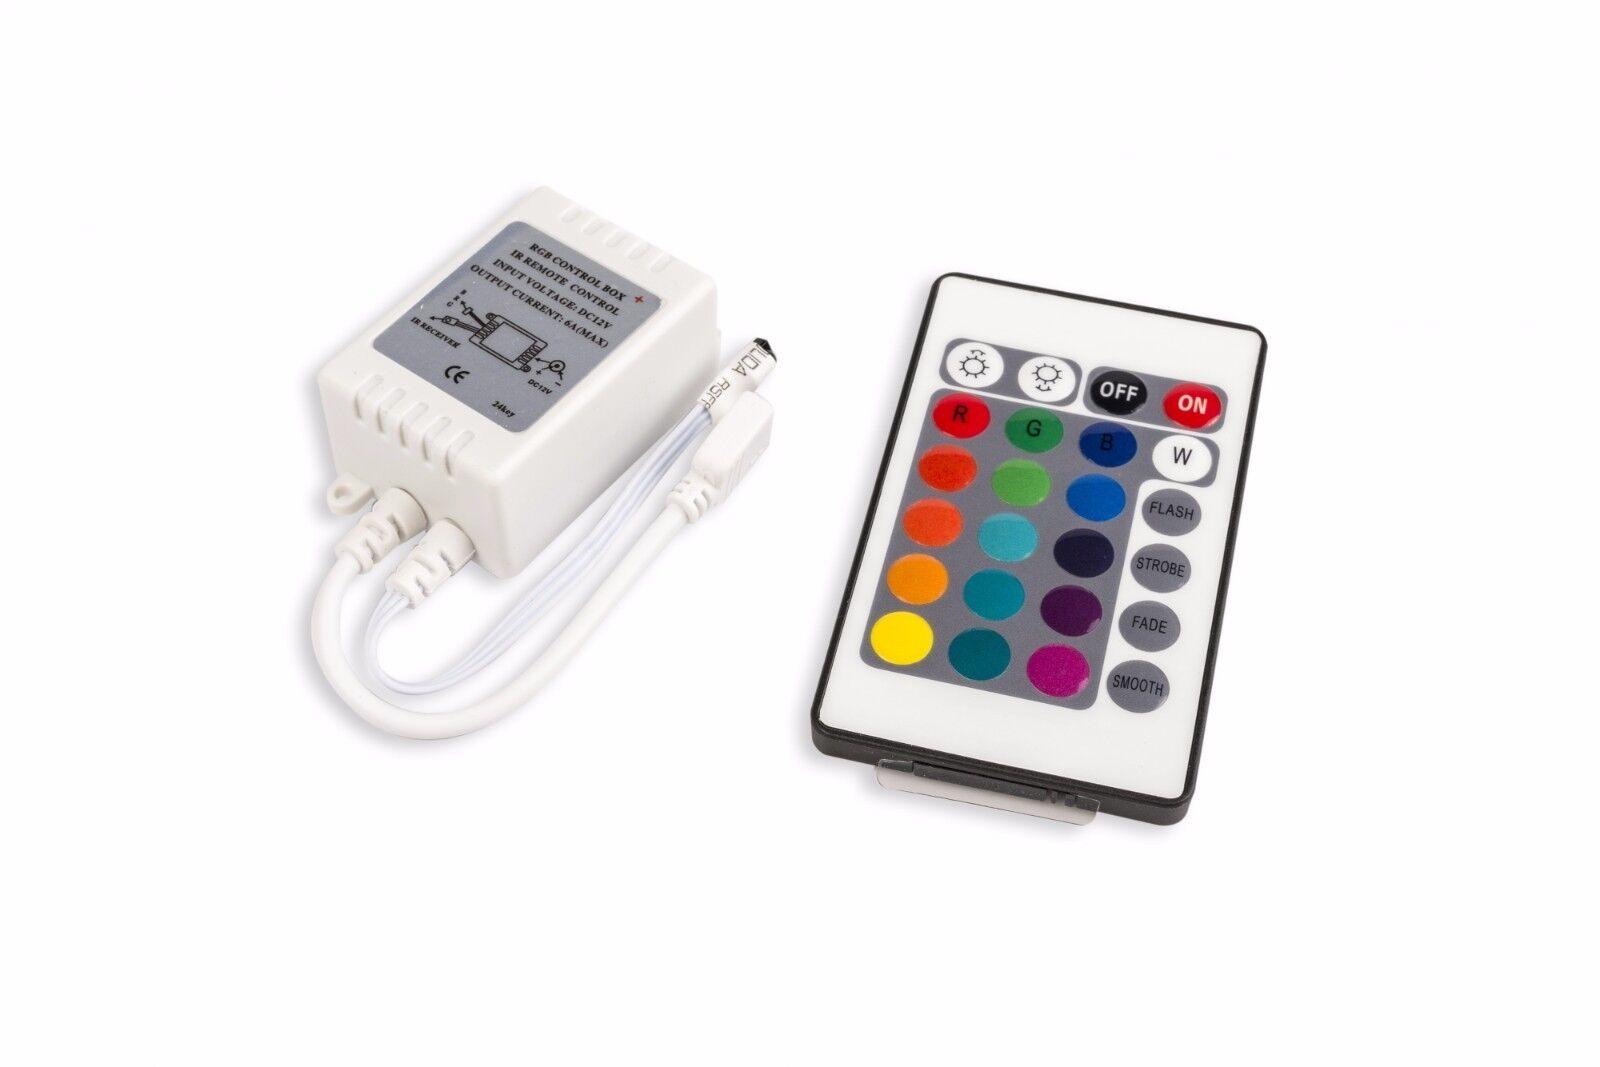 LUCE LUCE LUCE LED 15CM 9 Set di illuminazione RGB Scaffale Ripiani In Vetro Multi Coloree Kit mobili 61fa93